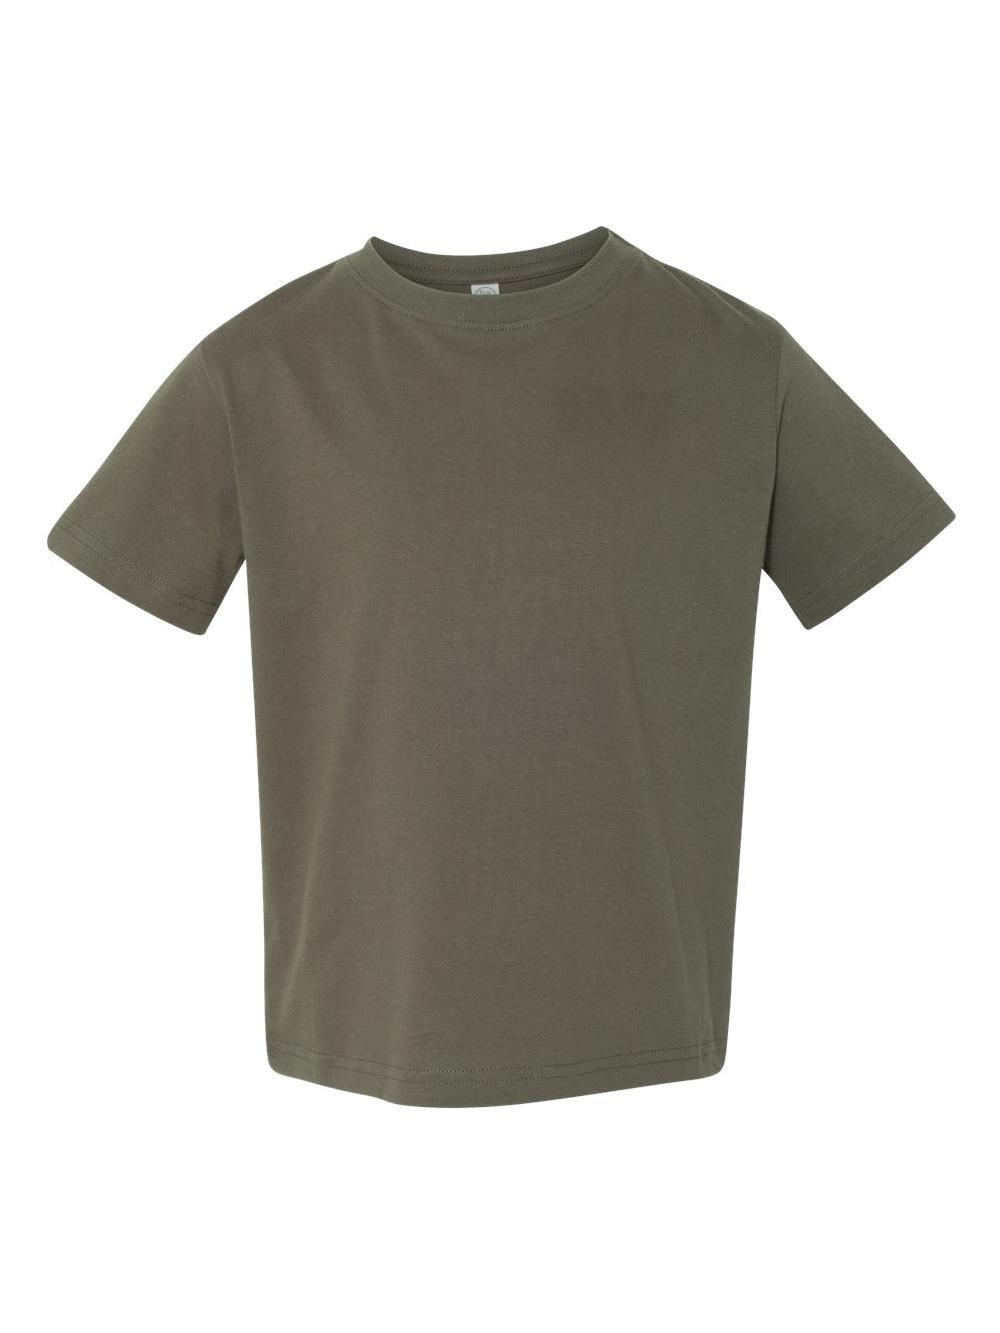 Rabbit SkinsToddler Premium Jersey Short Sleeve Tee 3080